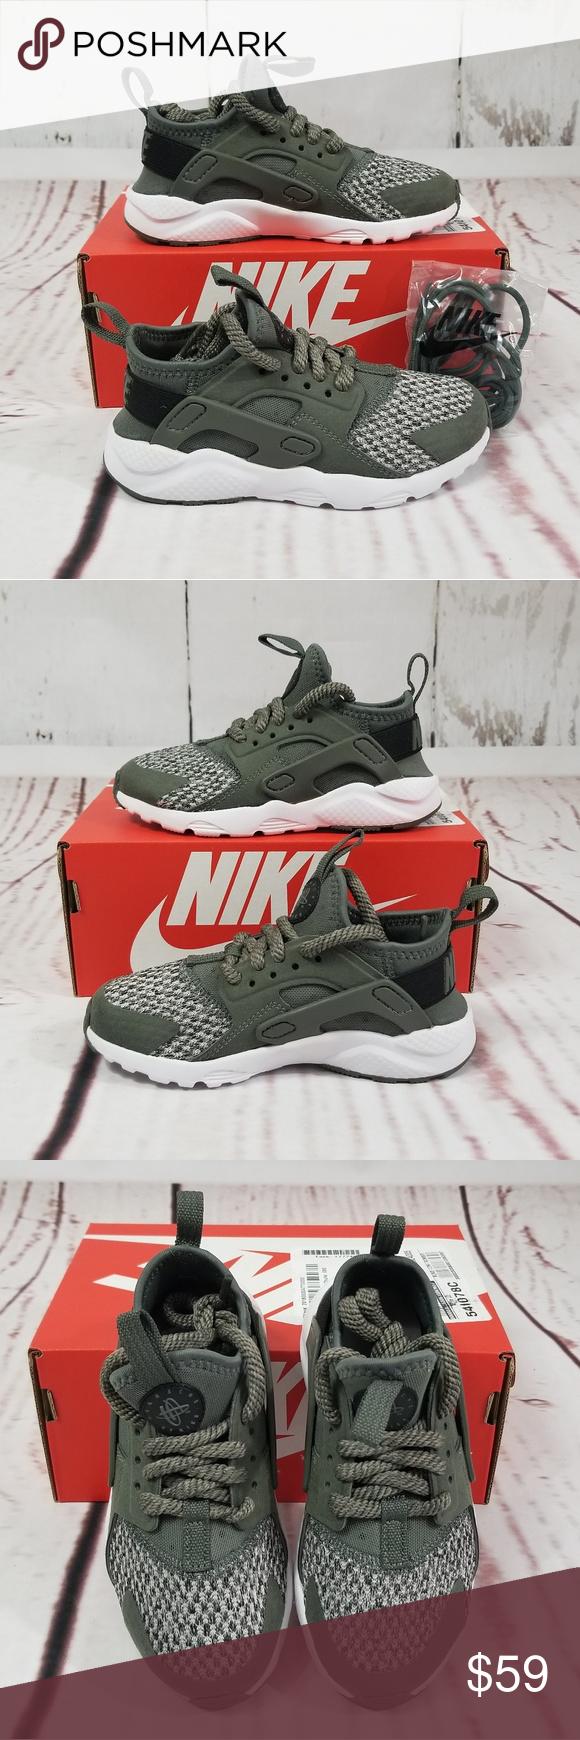 aa3ce75613d25 NIKE Huarache Run Ultra Boy s River Rock Sneakers New in box. Children s  size 10.5 Comes